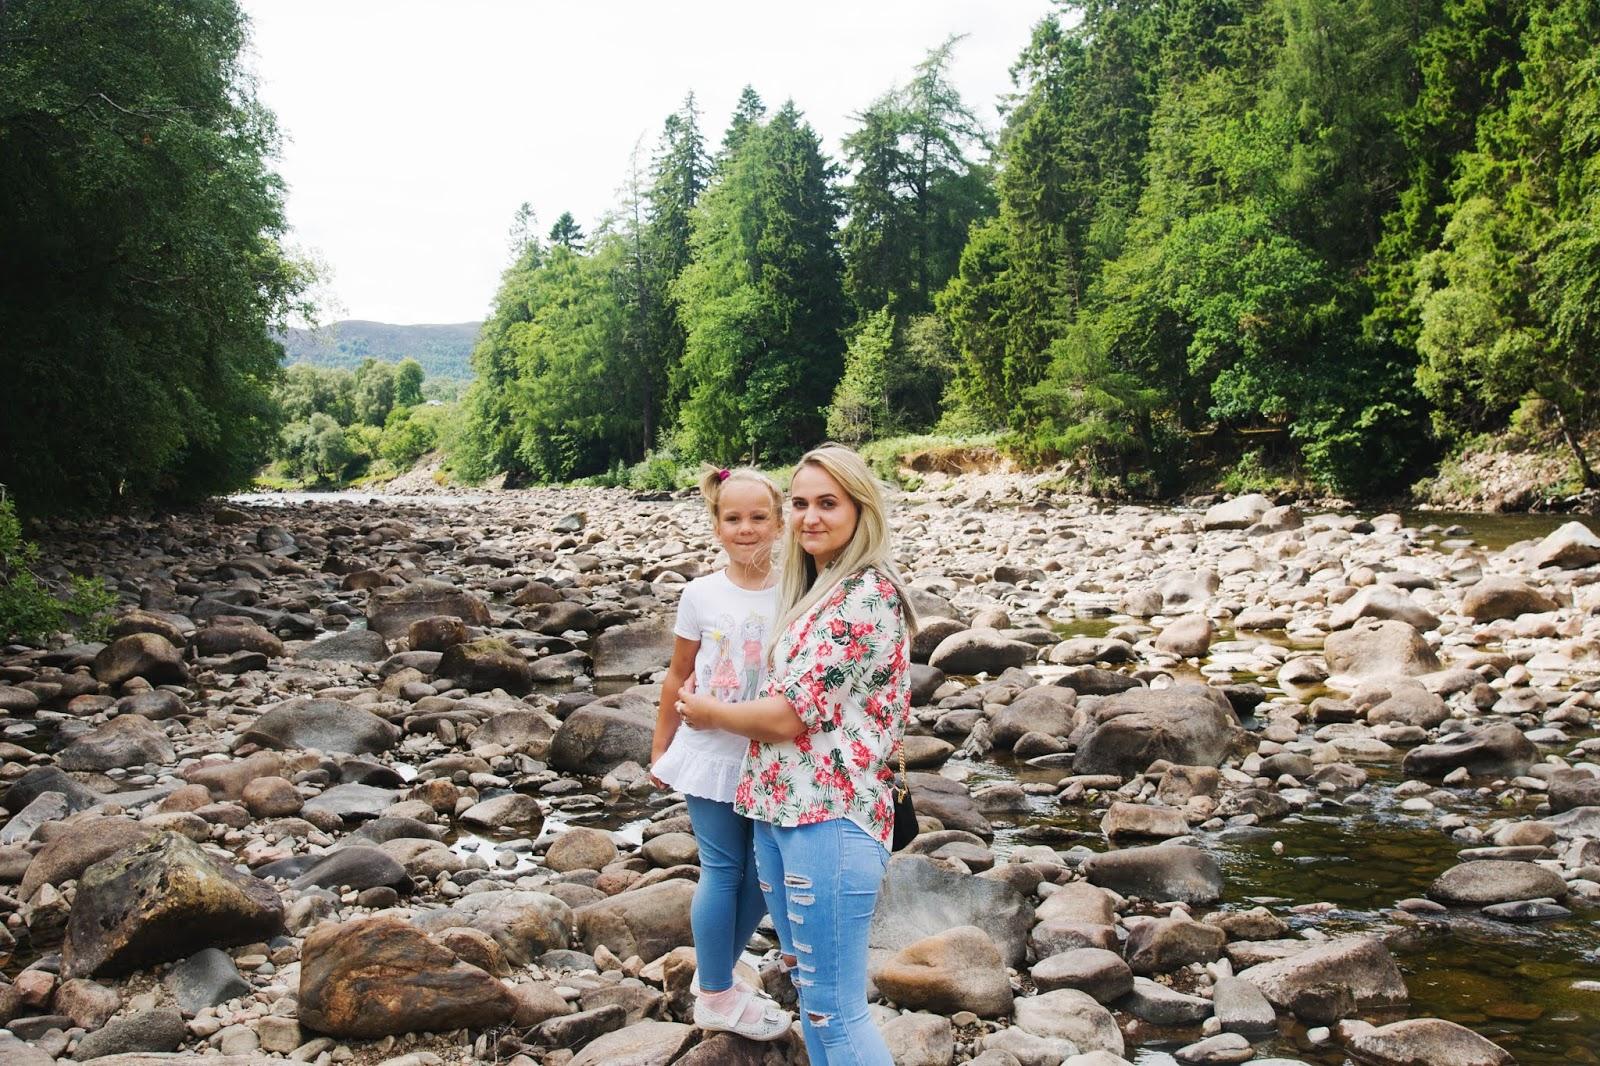 River dee rarmolar castle scotland aberdeen